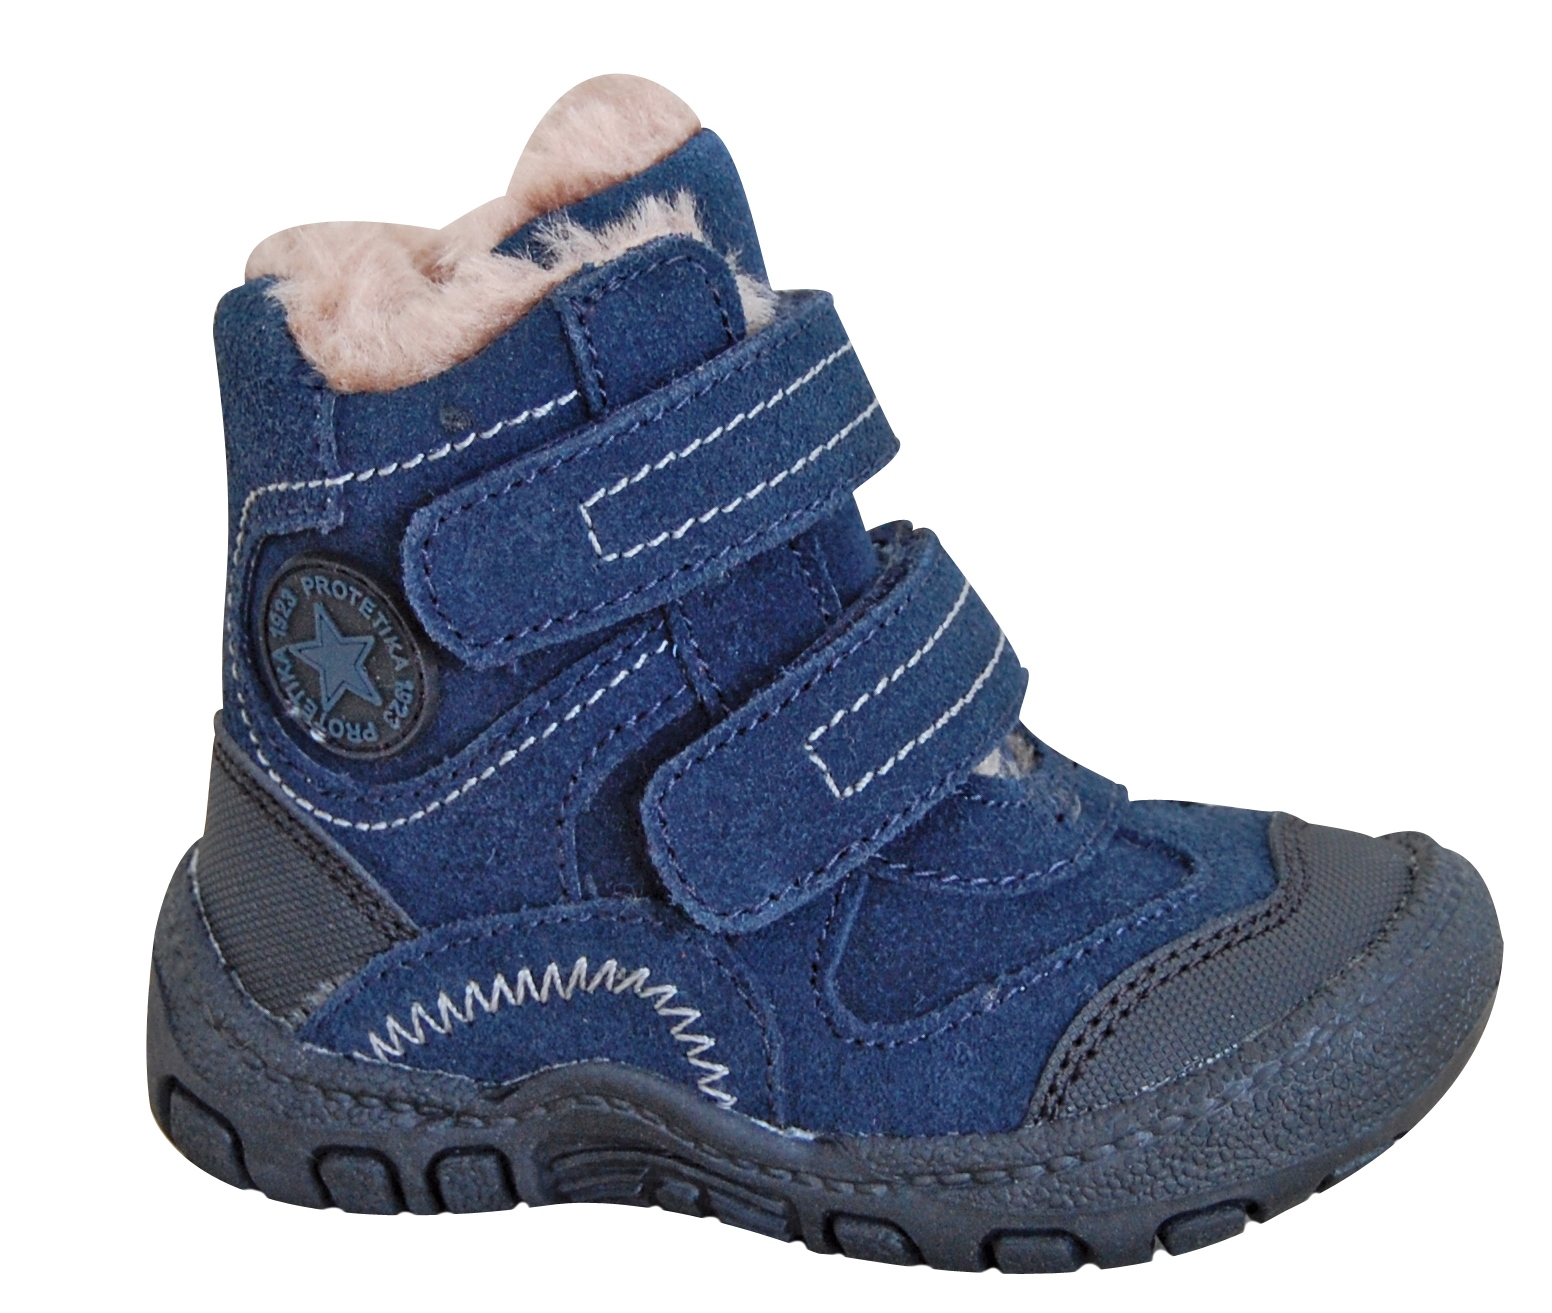 fd0cc938a7c4 Zimná obuv DEREX denim - zateplené kožušinkou empty